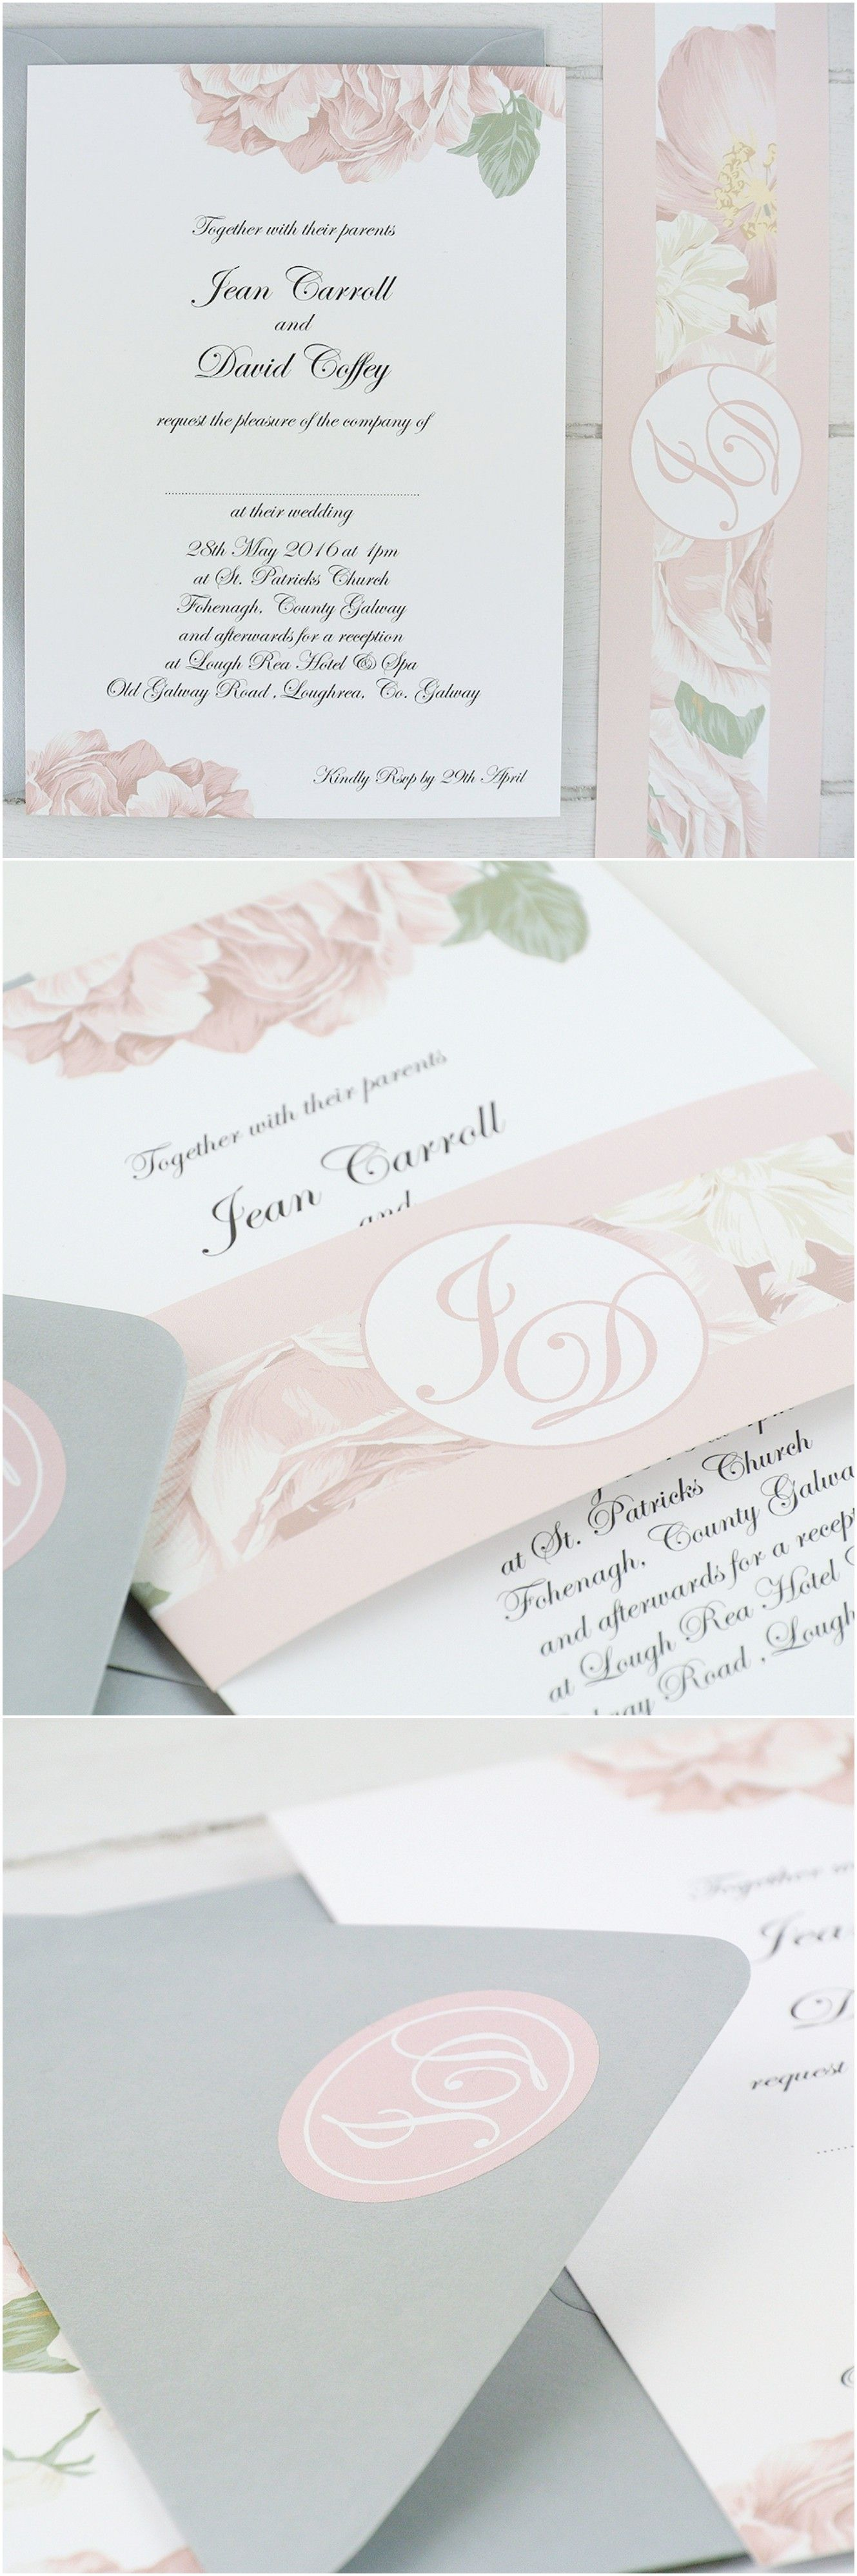 Blush pink peony rose wedding invitation with personalised wedding ...